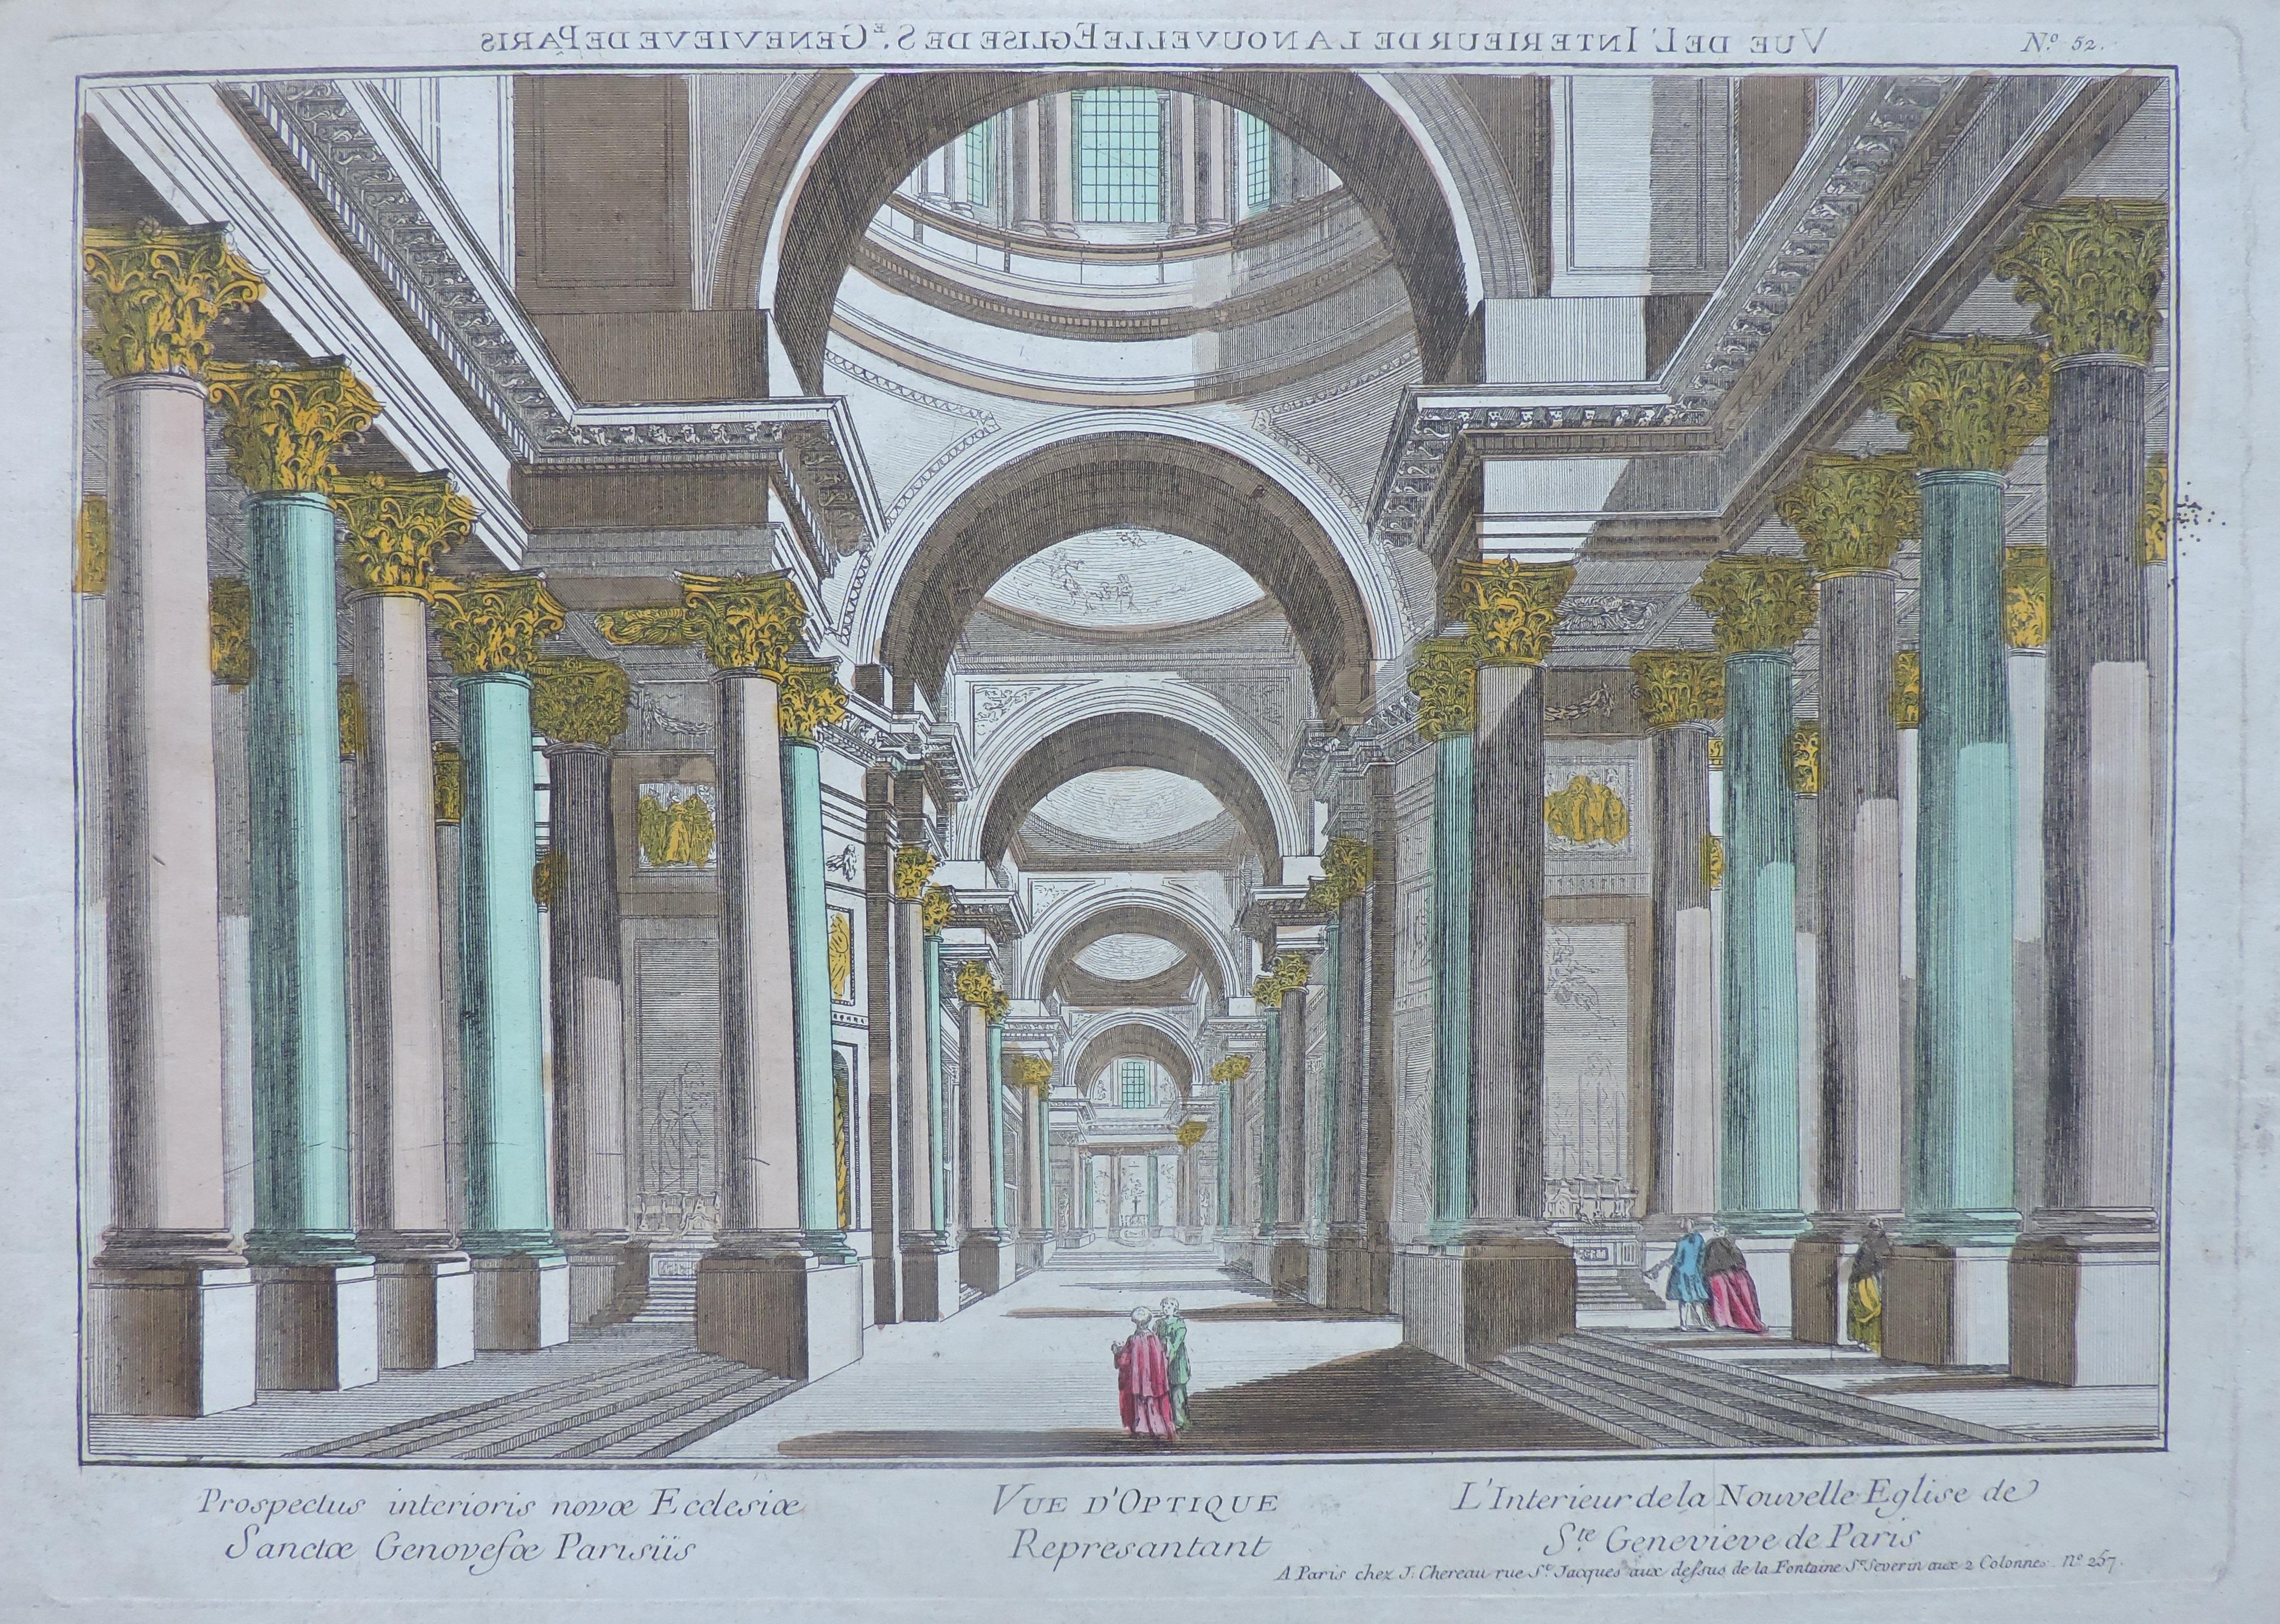 Paris – Eglise Sainte-Geneviève